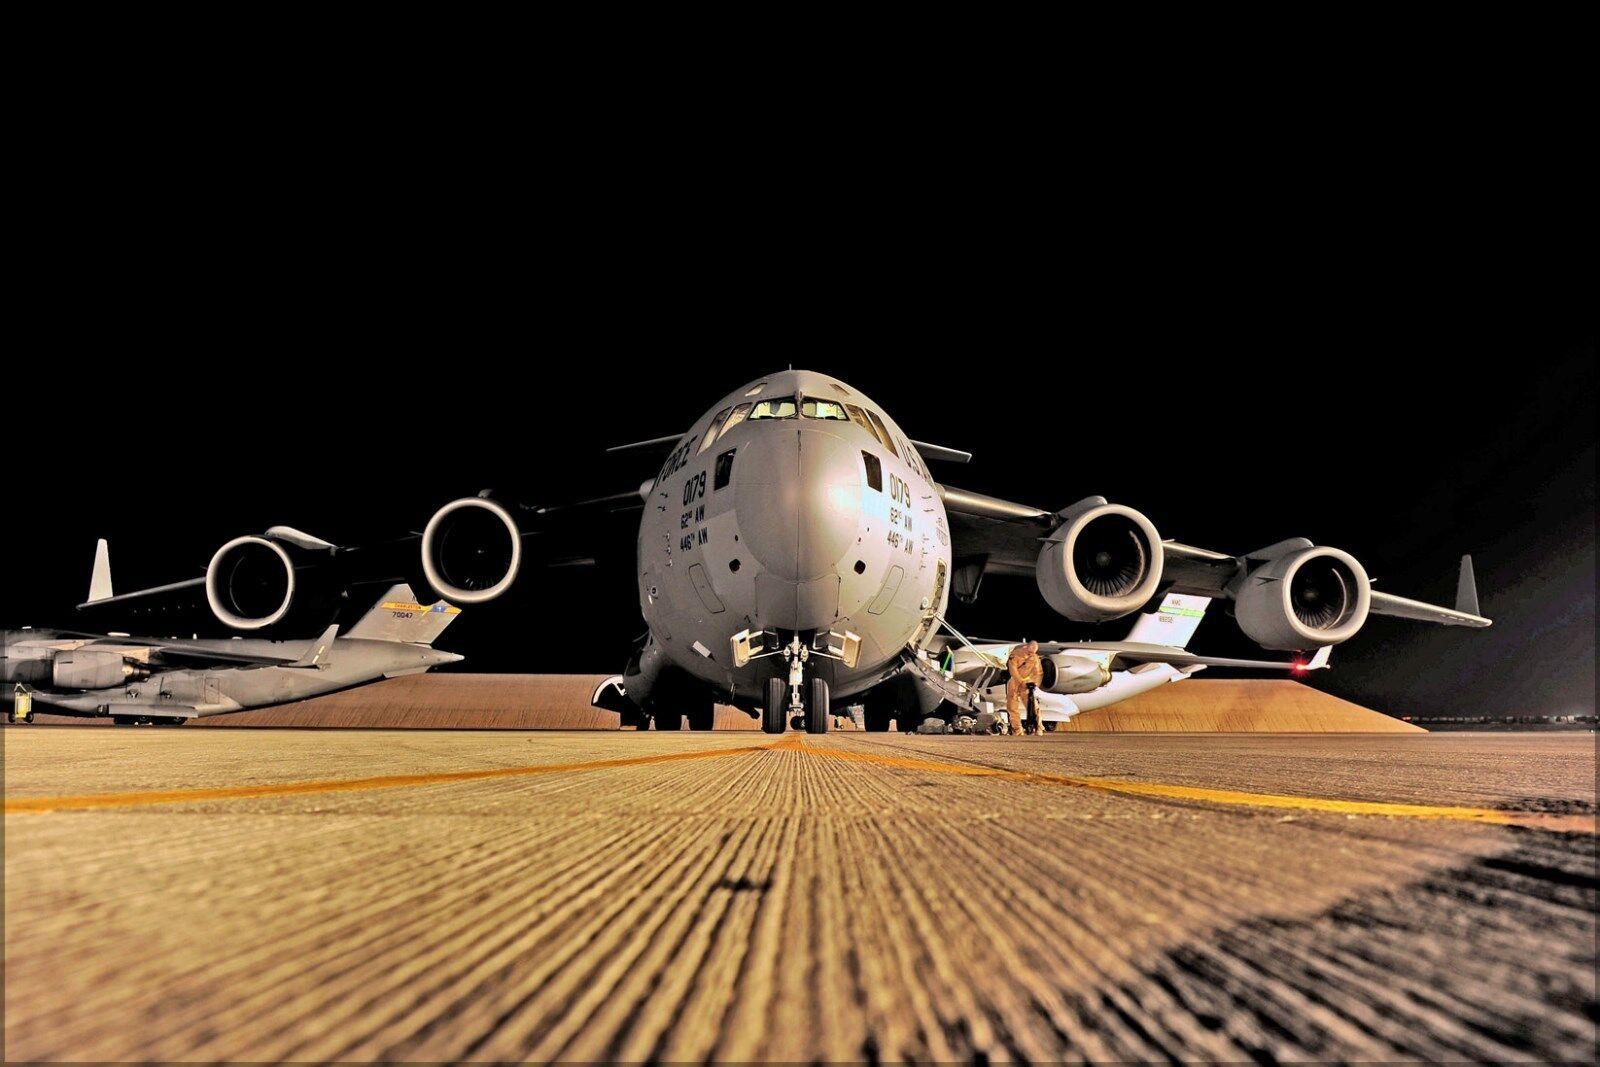 Plakat, Viele Größen; U.S.Air Force C-17 Globemaster III Flugzeug